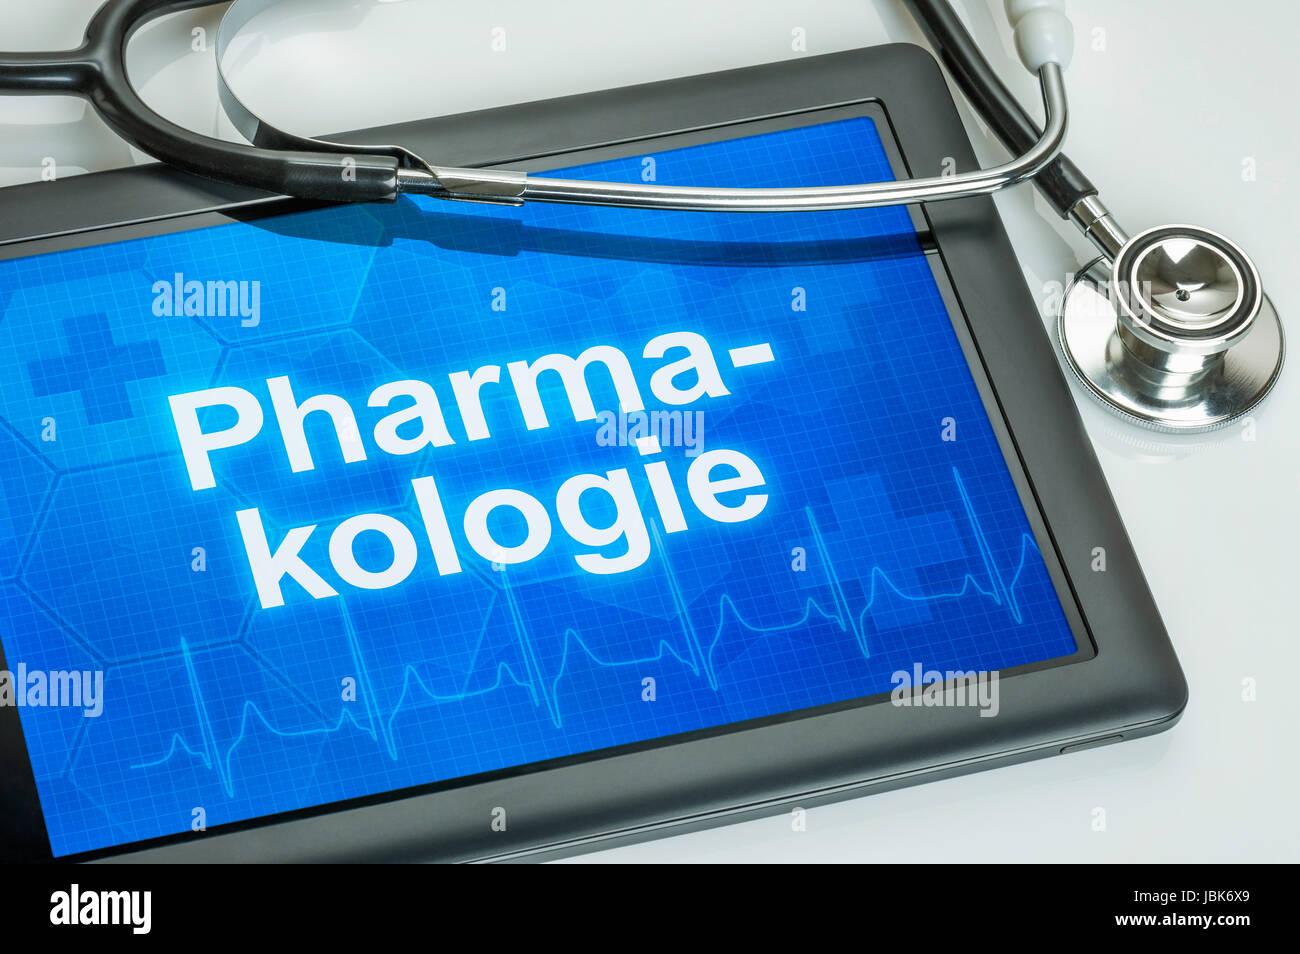 Tablet Mit Dem Fachgebiet Pharmakologie Auf Dem Display Stockfoto